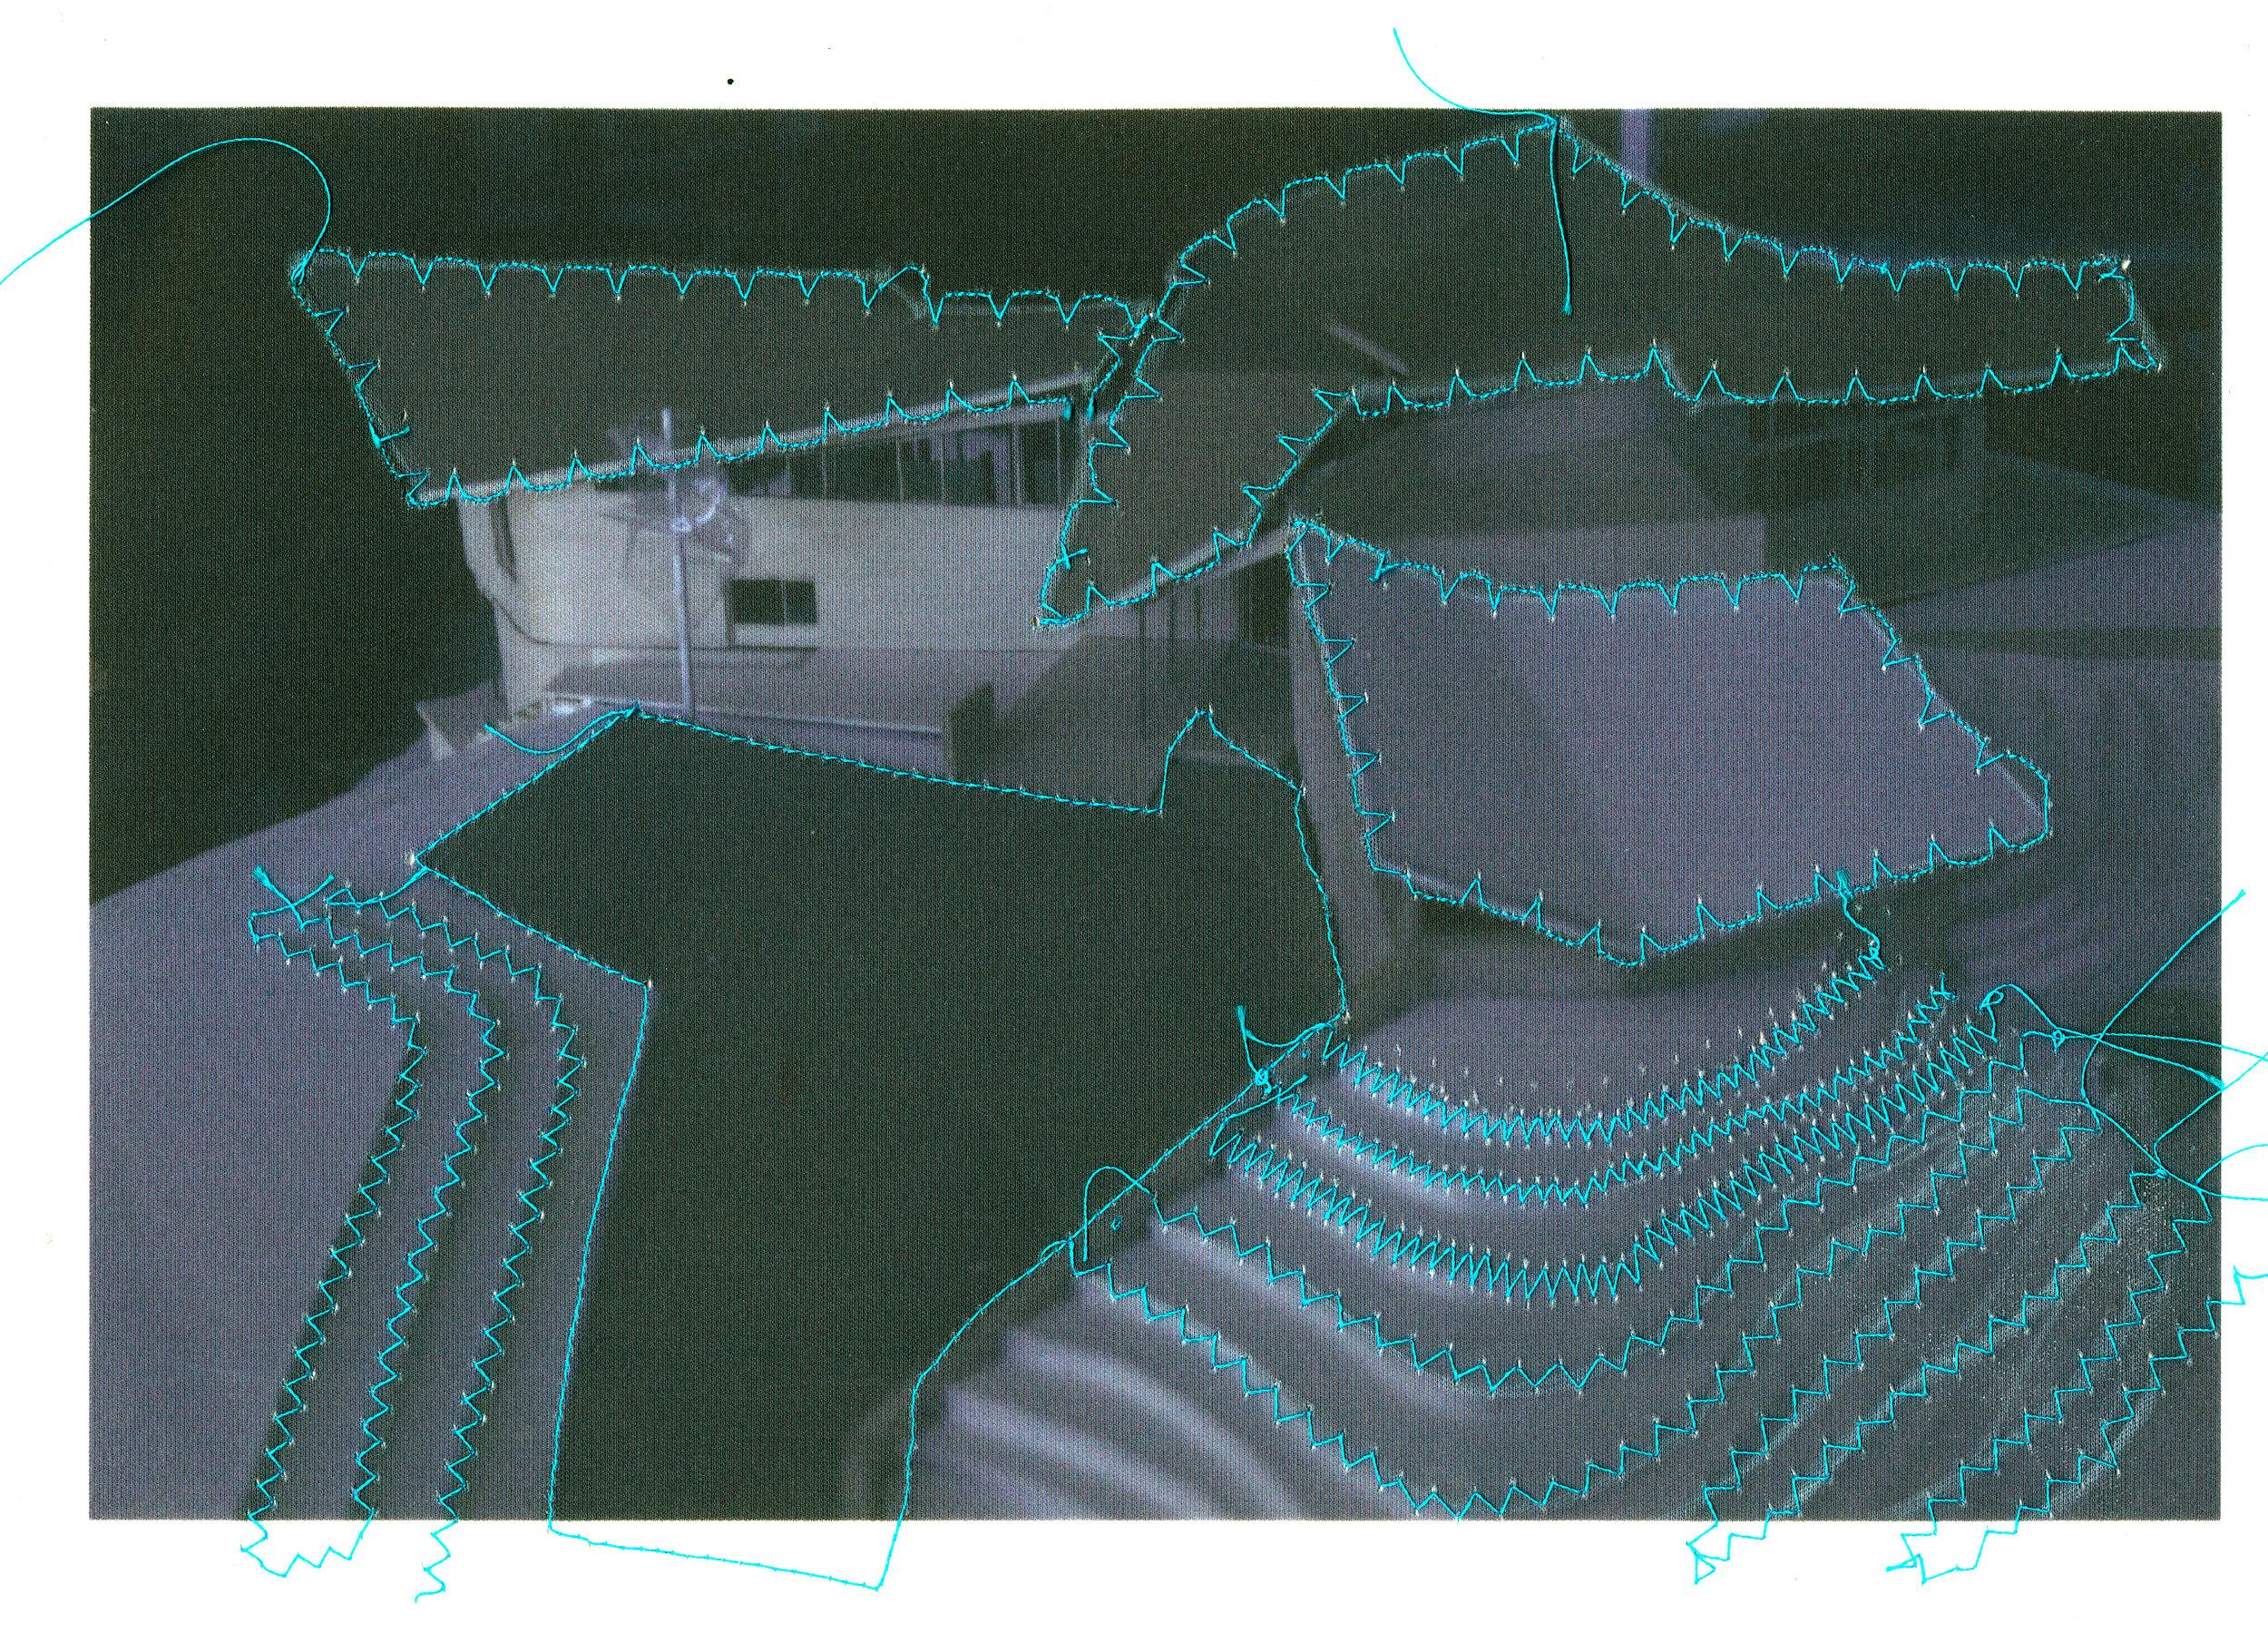 20120216-Untitled-2-2 copy.jpg